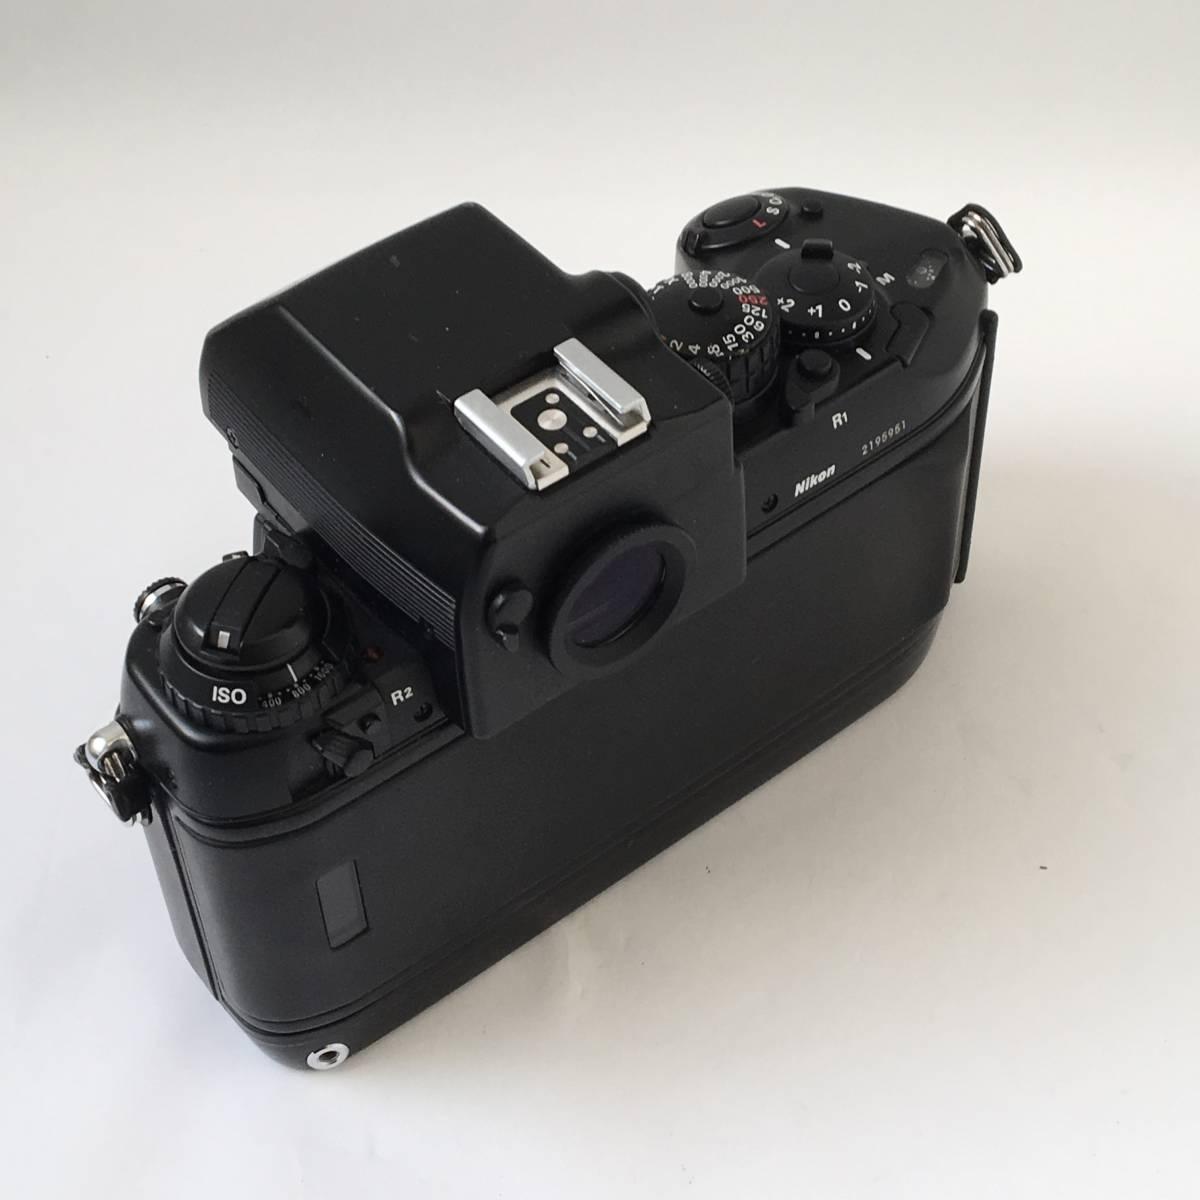 Nikon F4 MADE IN JAPAN